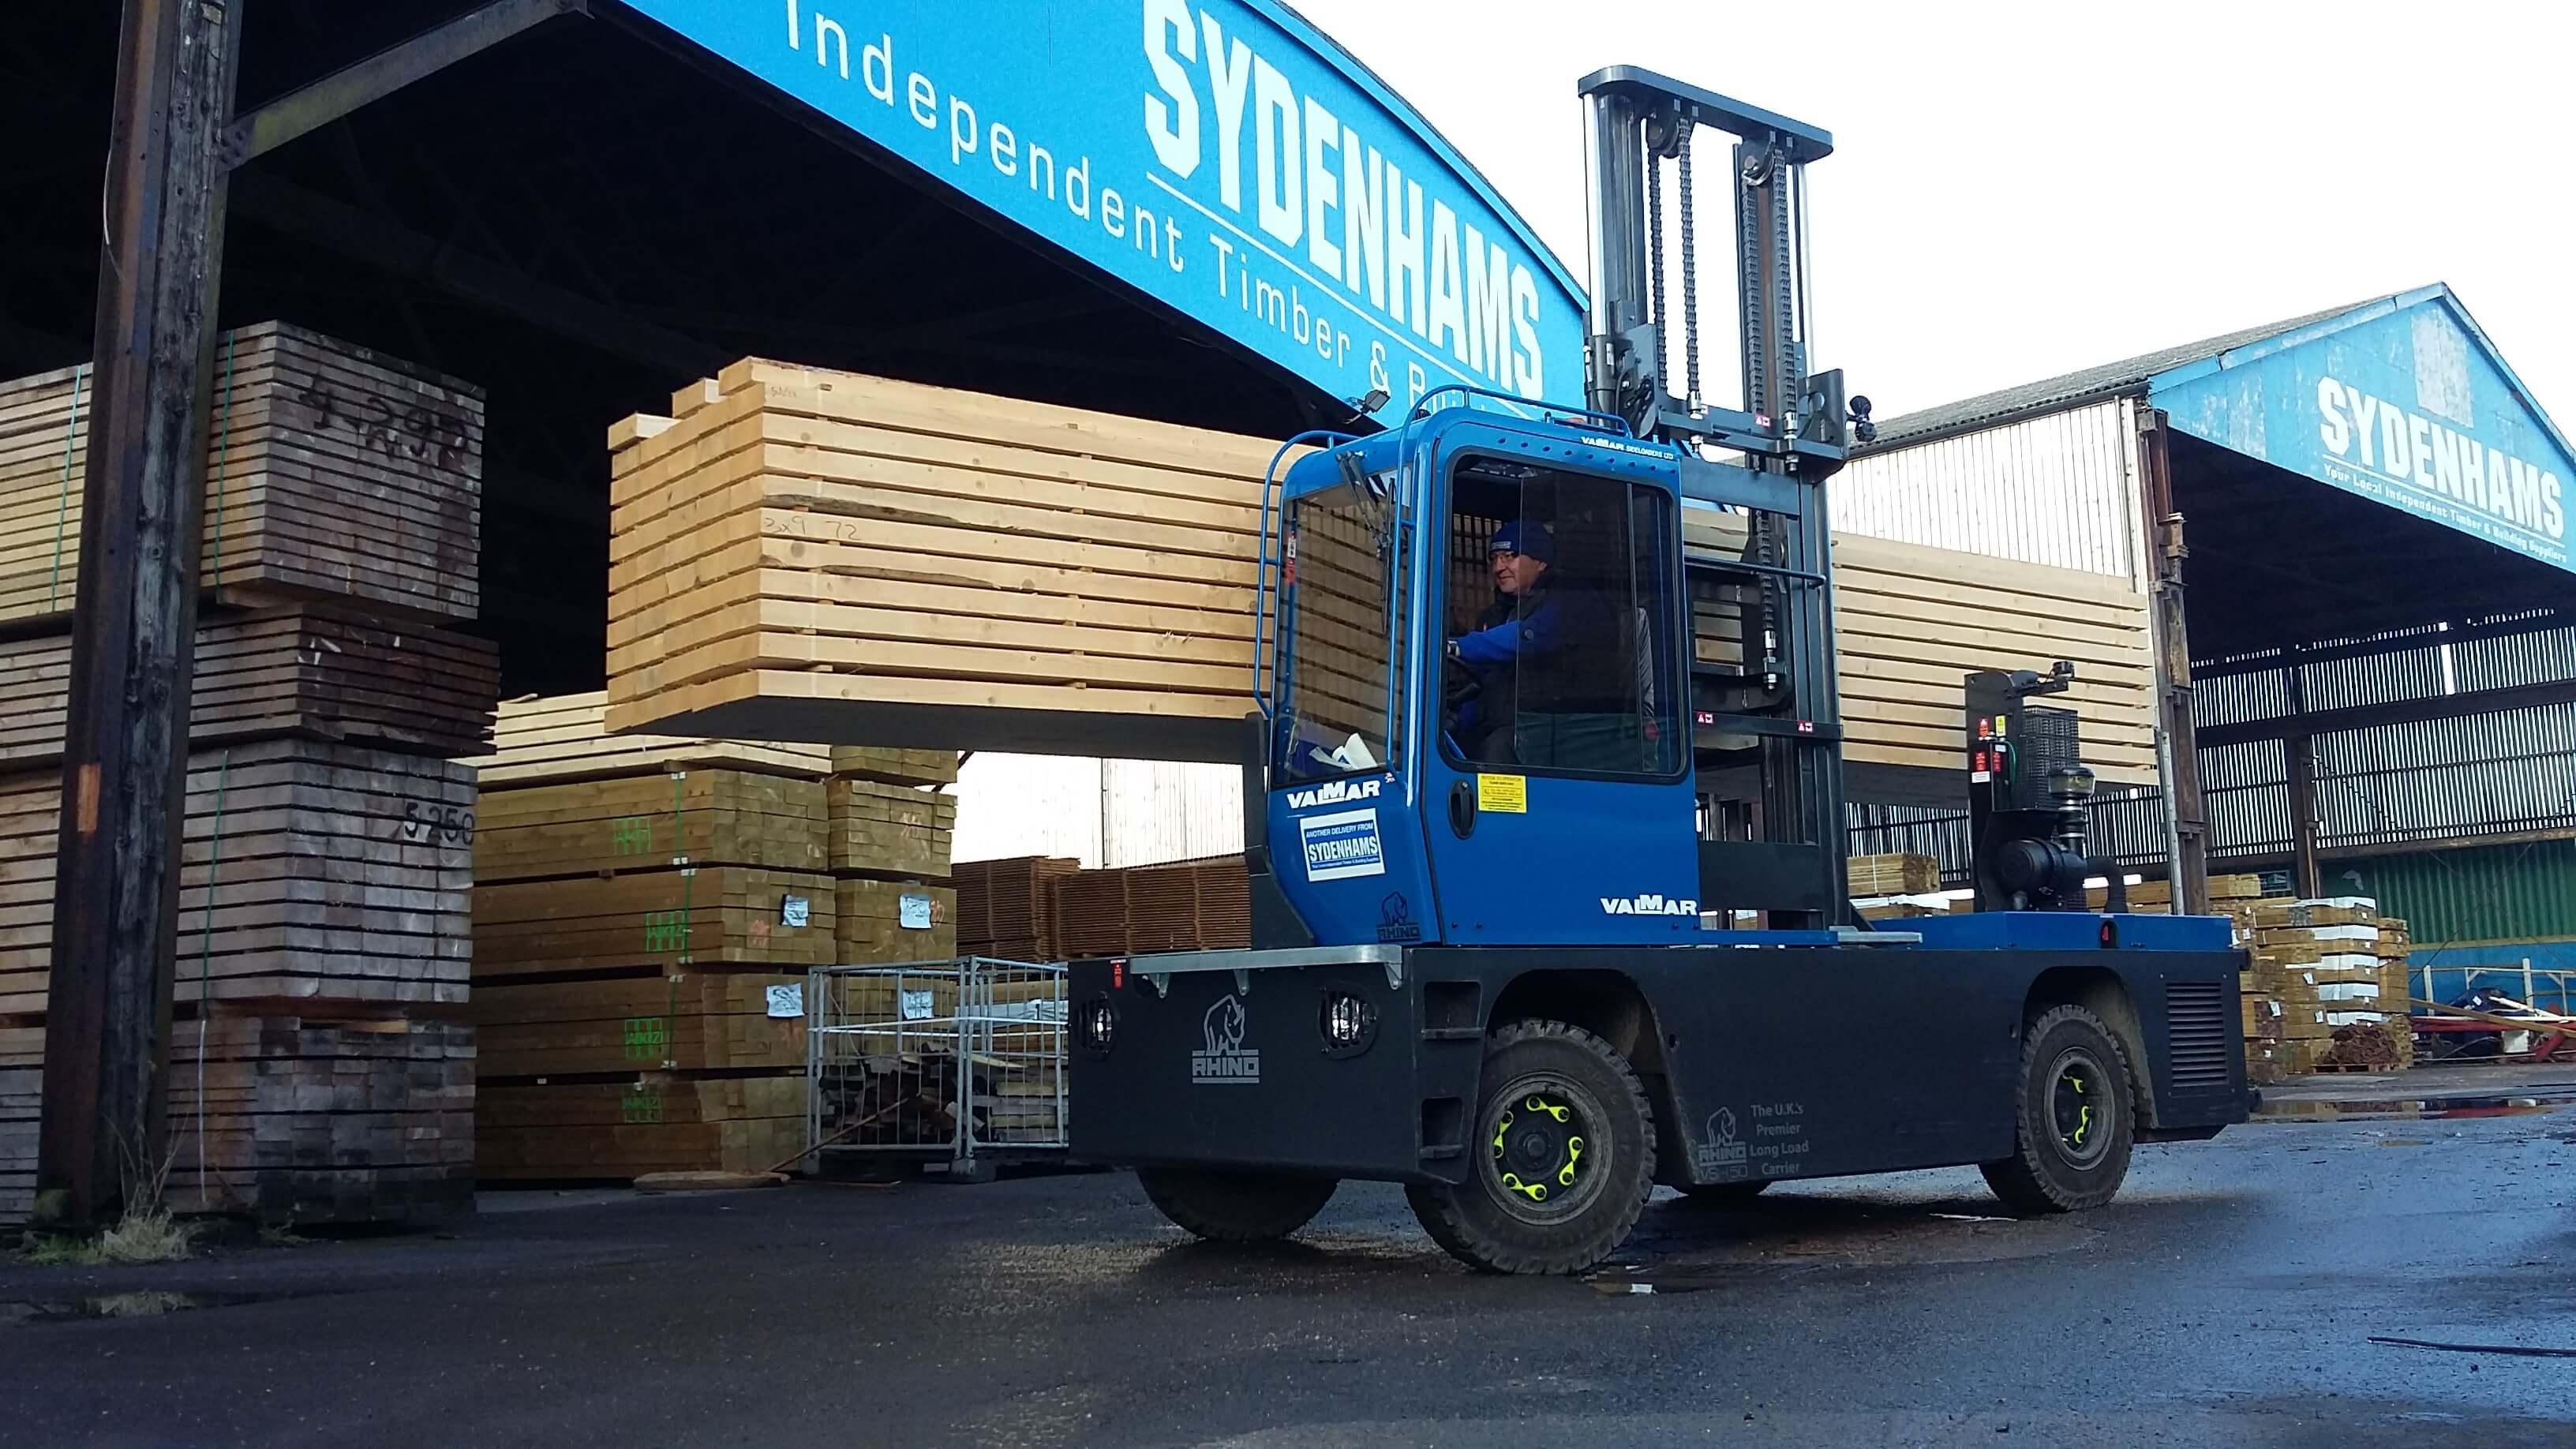 Sydenhams Timber Forklift